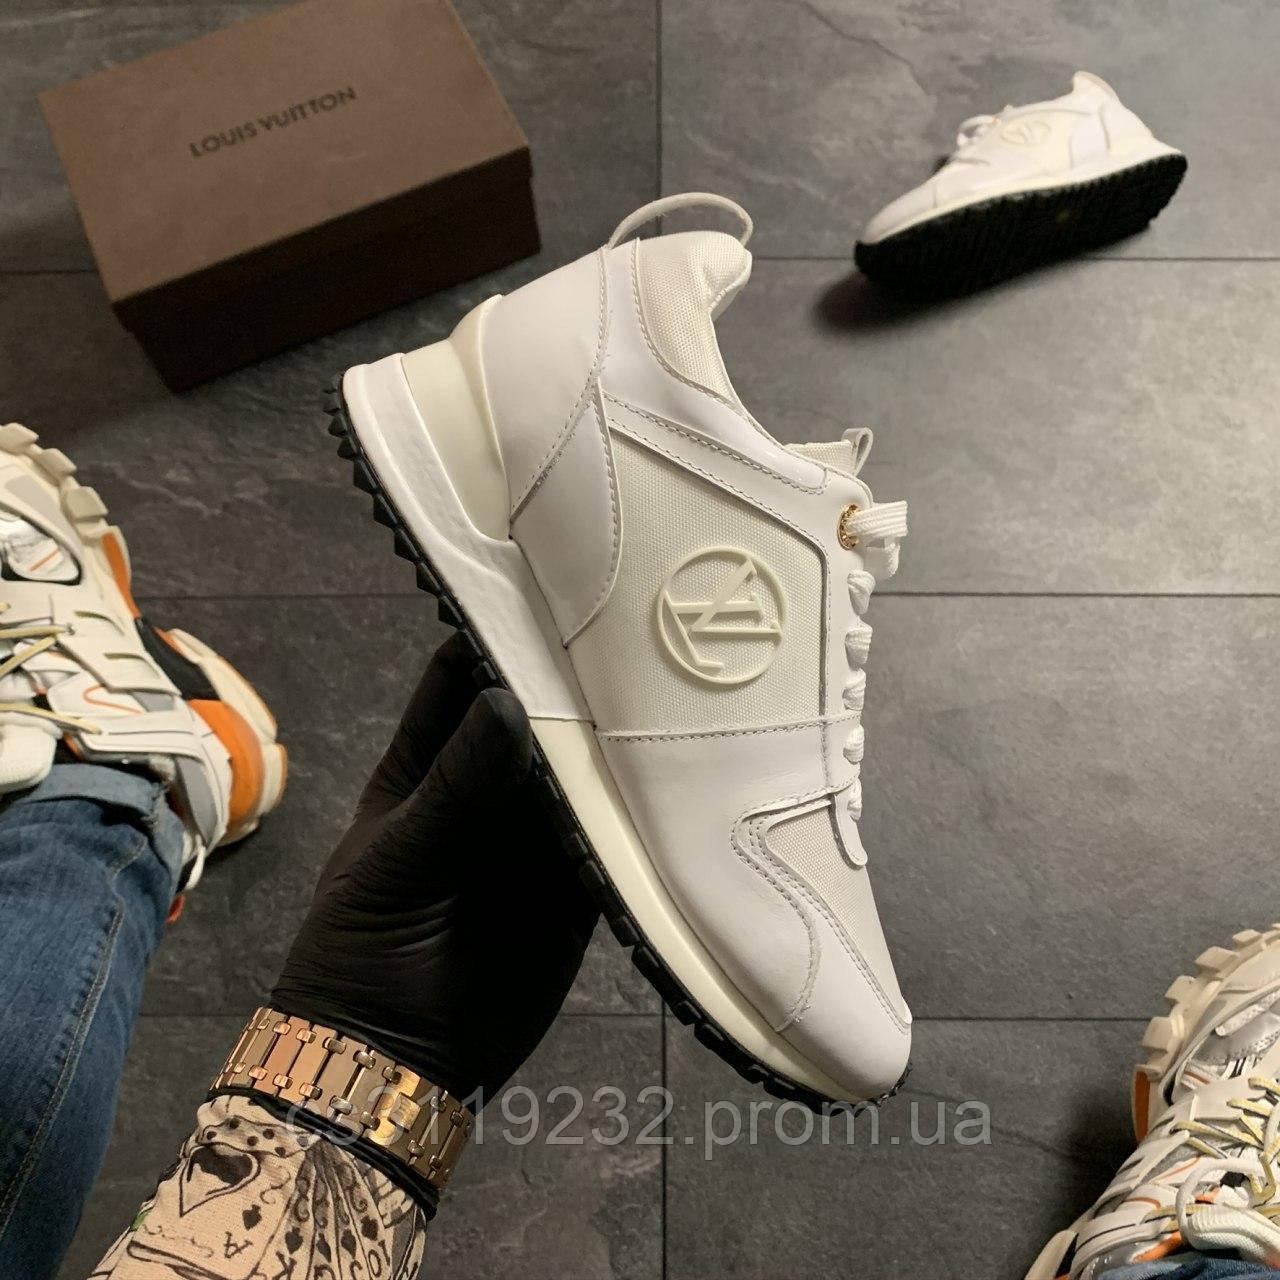 Женские кроссовки Louis Vuitton White (белые)